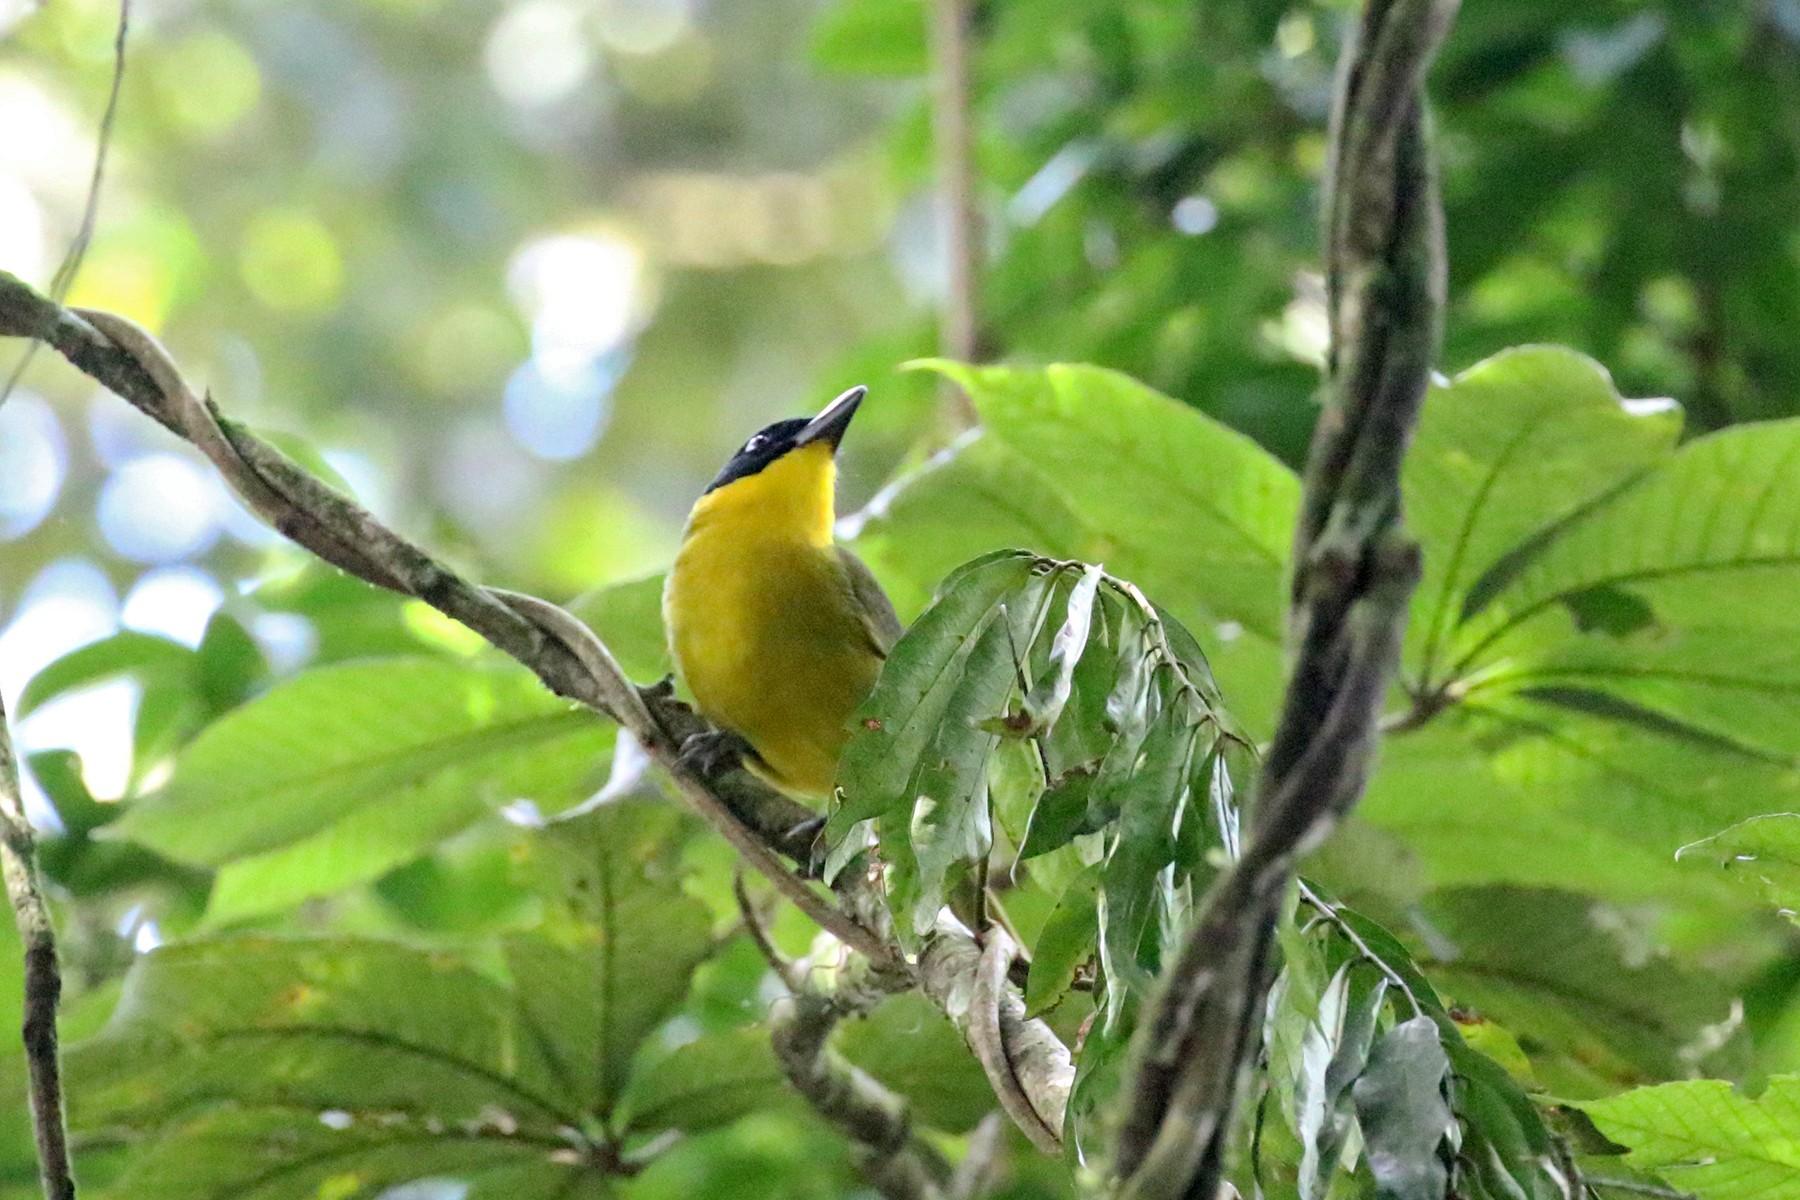 Uluguru Bushshrike - Charley Hesse TROPICAL BIRDING